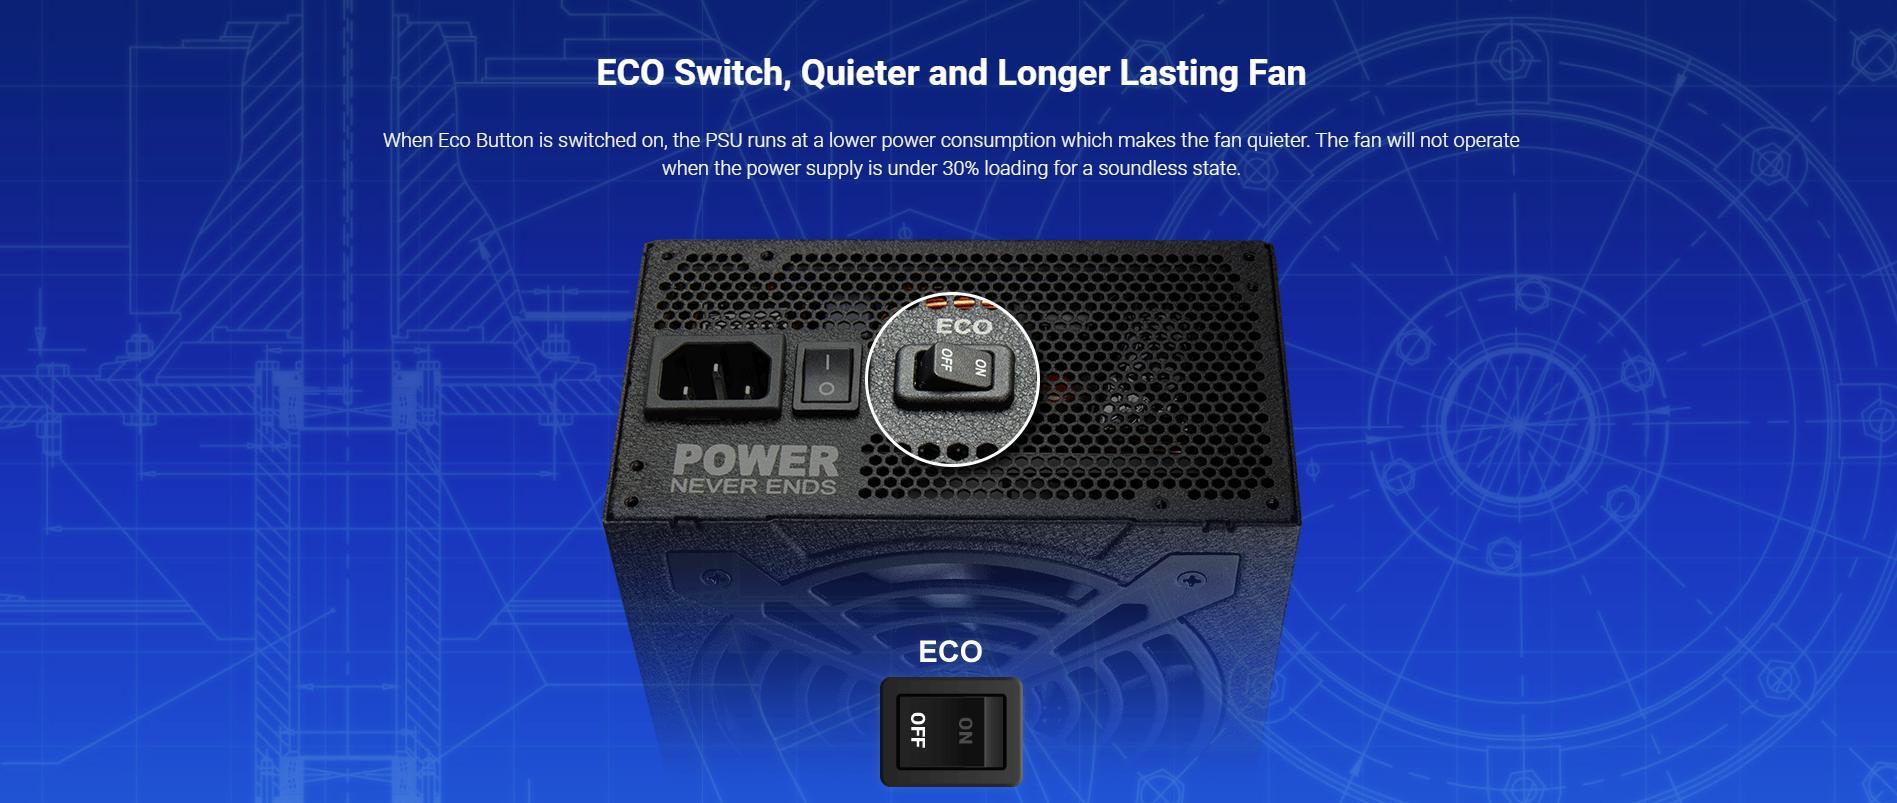 FSP Power Supply HYDRO G PRO Series Model HG2-1000 - Active PFC - 80 Plus Gold - Full Modular giới thiệu 4